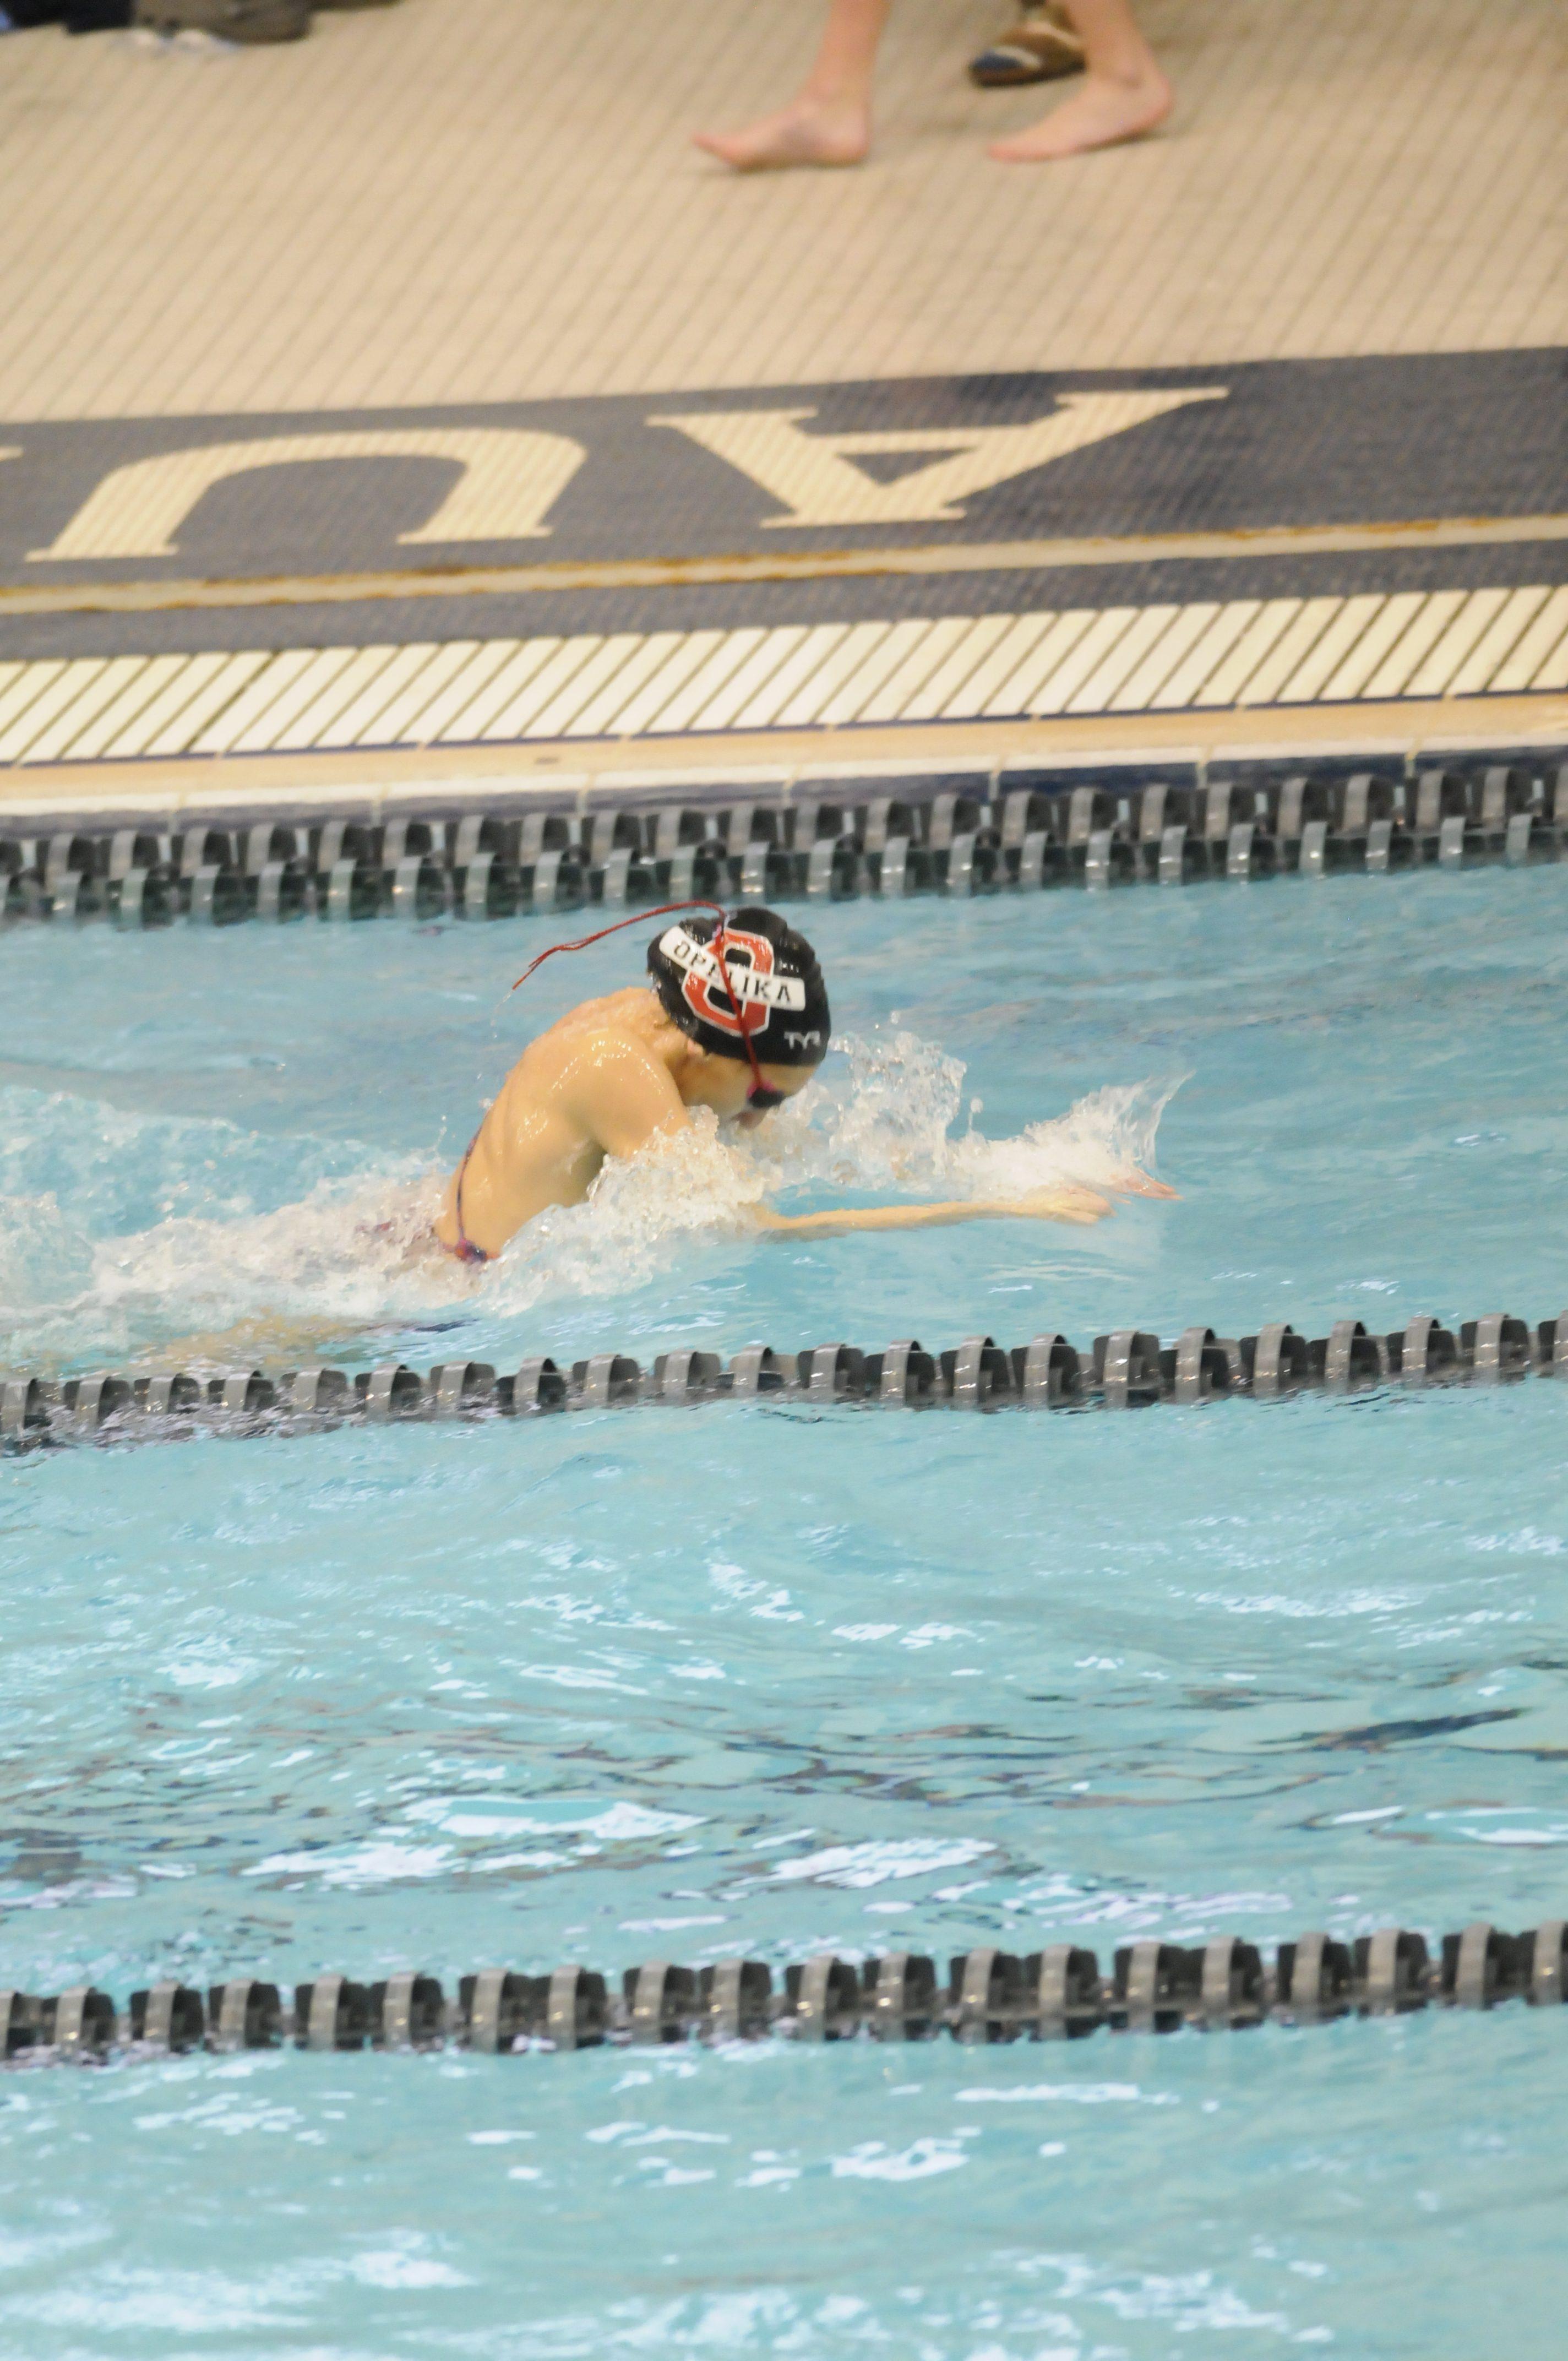 Defending Champions Repeat at the 2019 AHSAA Swimming & Diving Championships Saturday